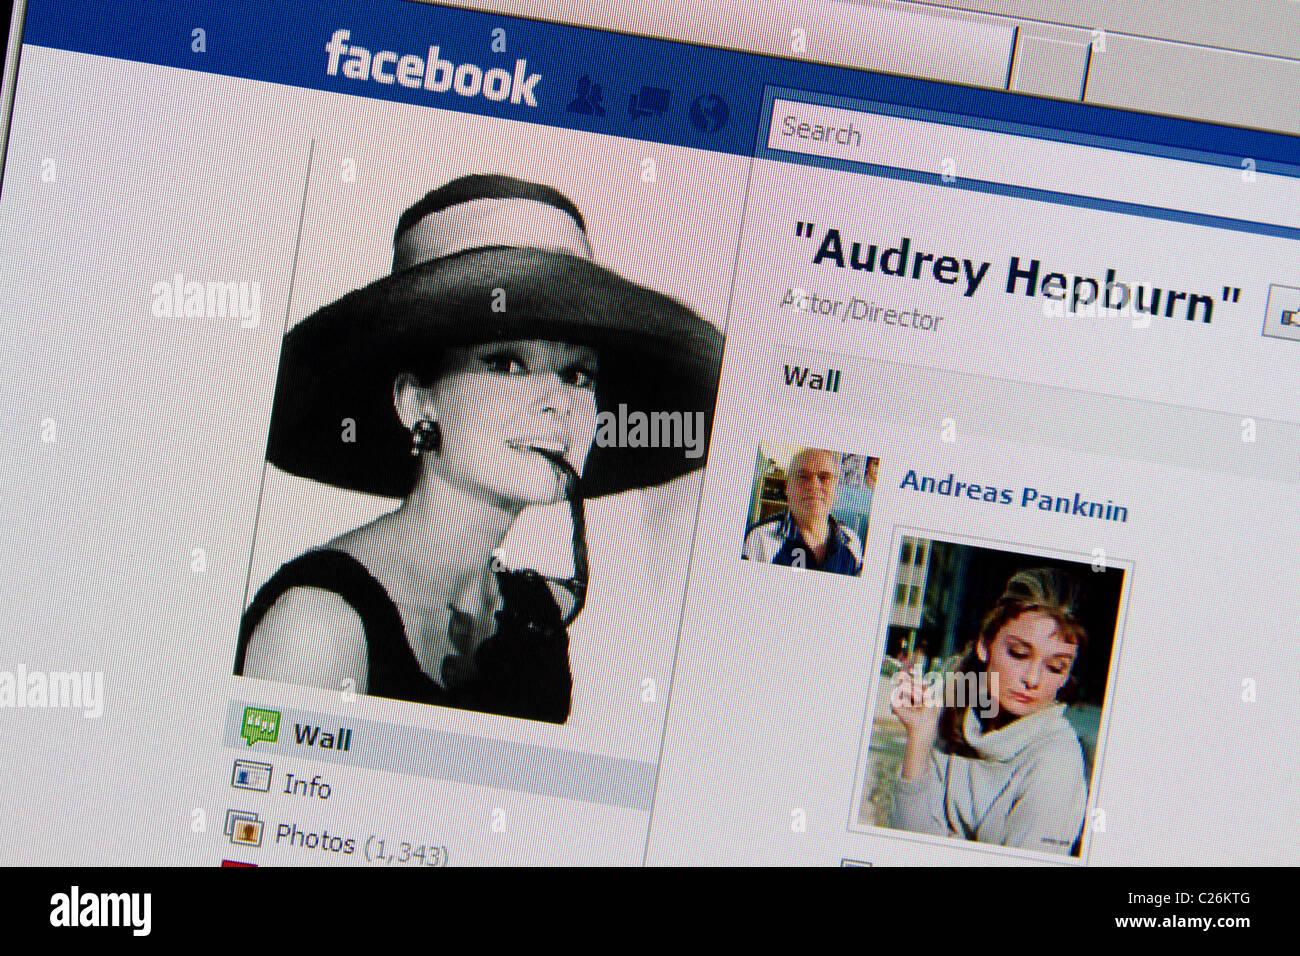 Audrey Hepburn facebook fanpage Photo Stock